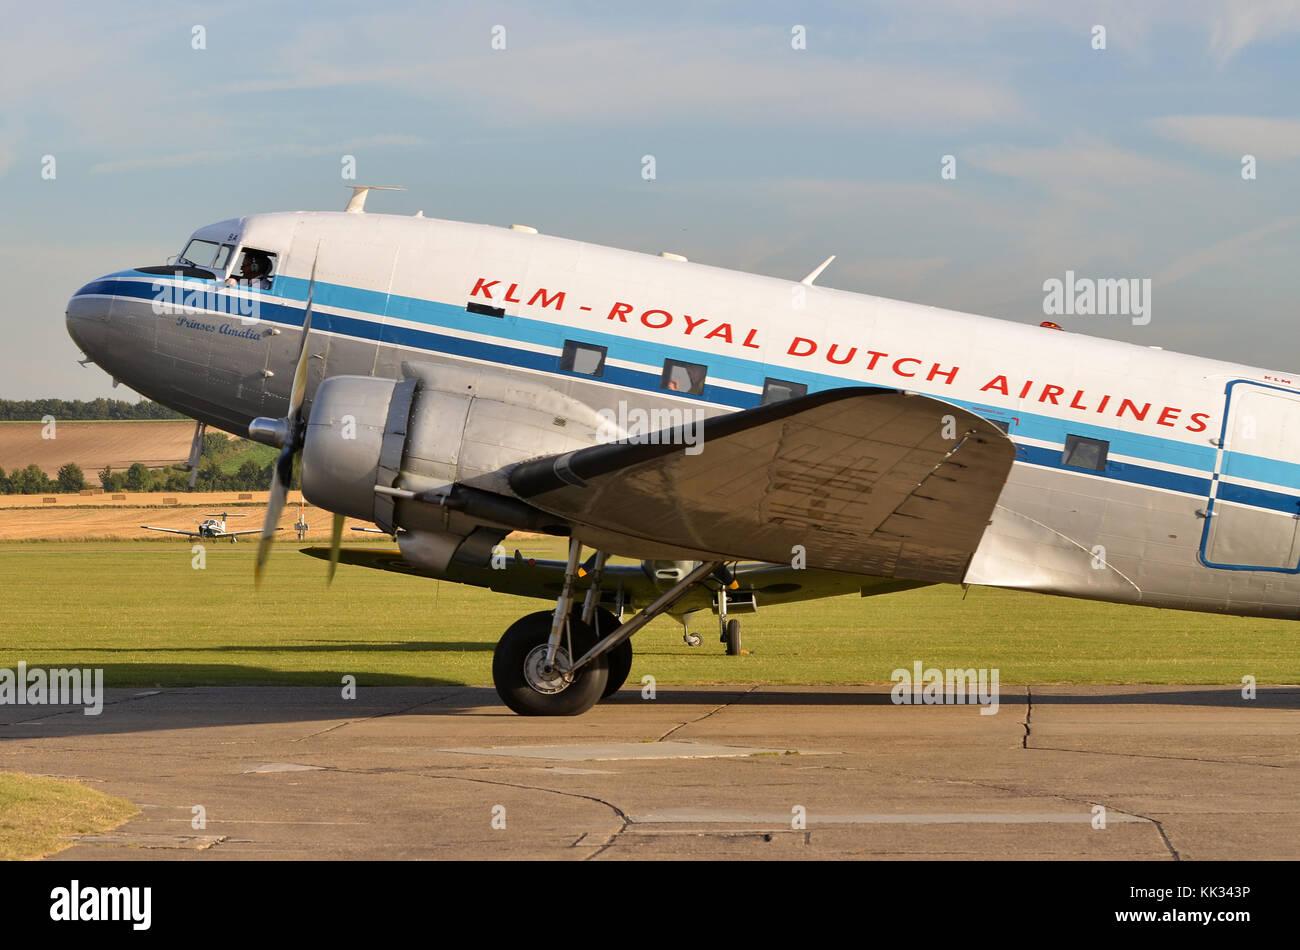 Douglas C-47A Skytrain, KLM Livery, Duxford, UK. The C-47 was the military designation for the DC-3 Dakota. - Stock Image